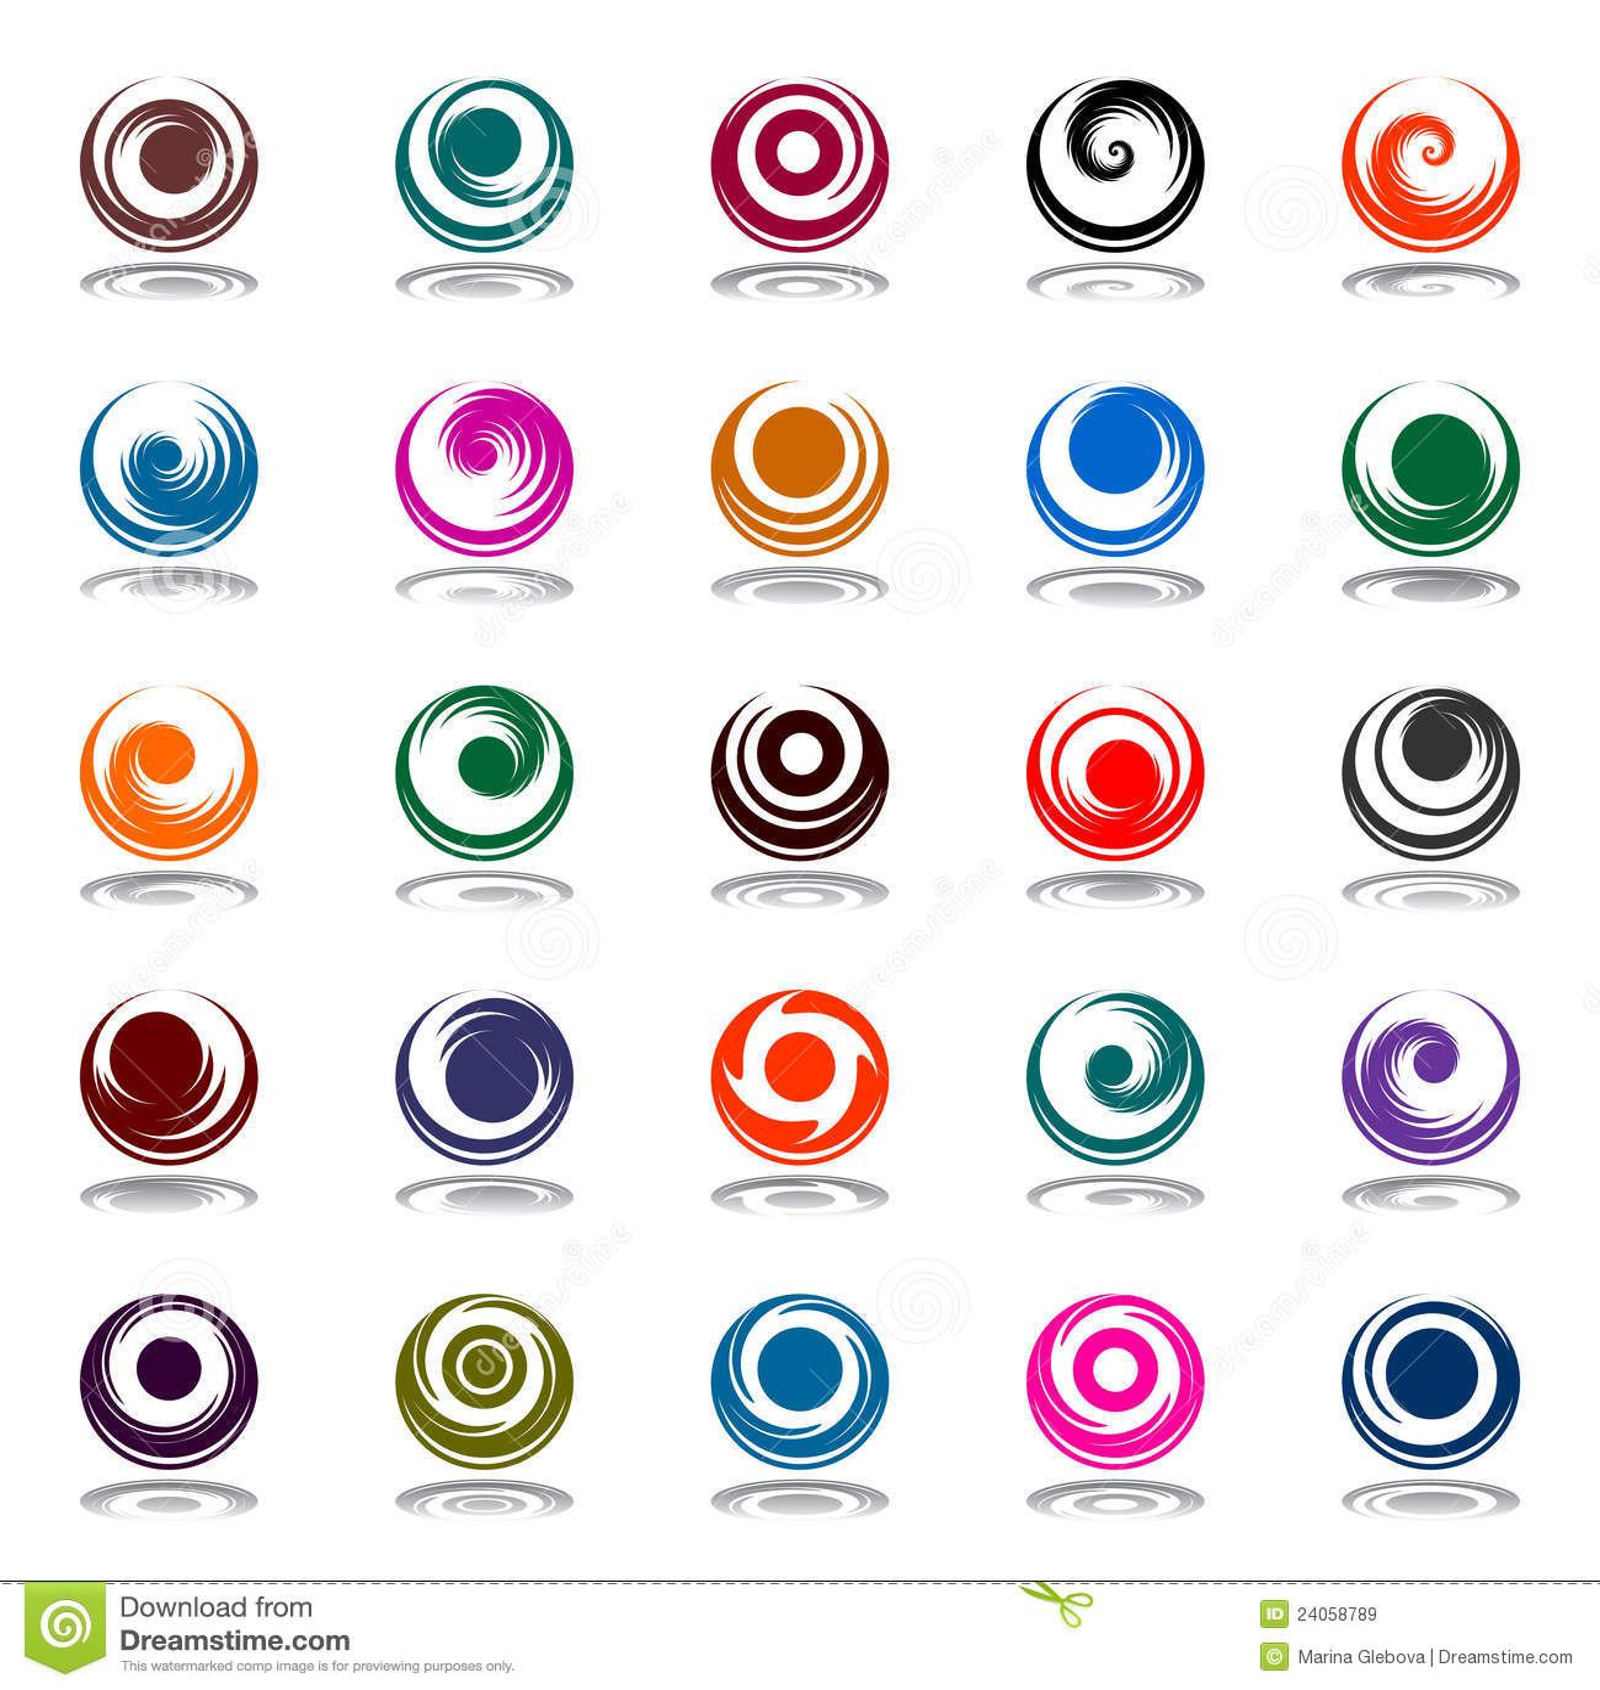 Elements Of Design Movement : Design elements shape pixshark images